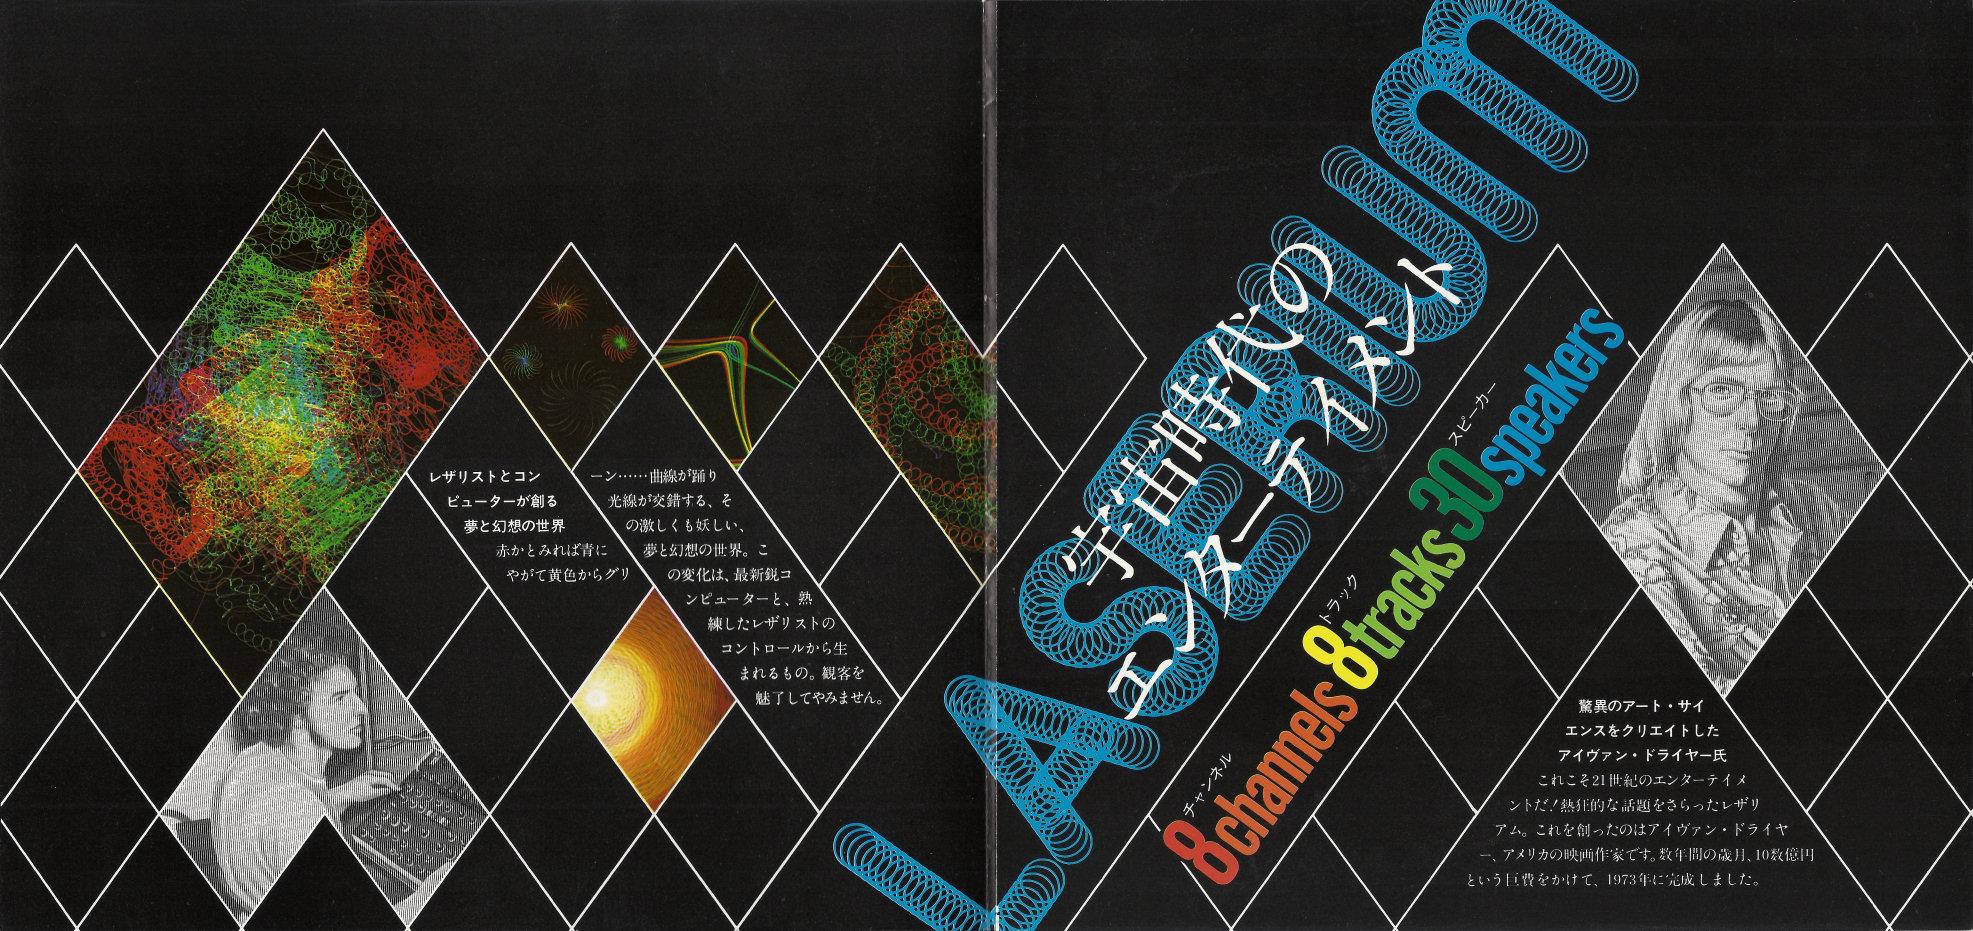 http://tokyosky.to/tokyosky_webmasters_blog/2014/03/21/blogimage/S_Laserium_program3_4.jpg